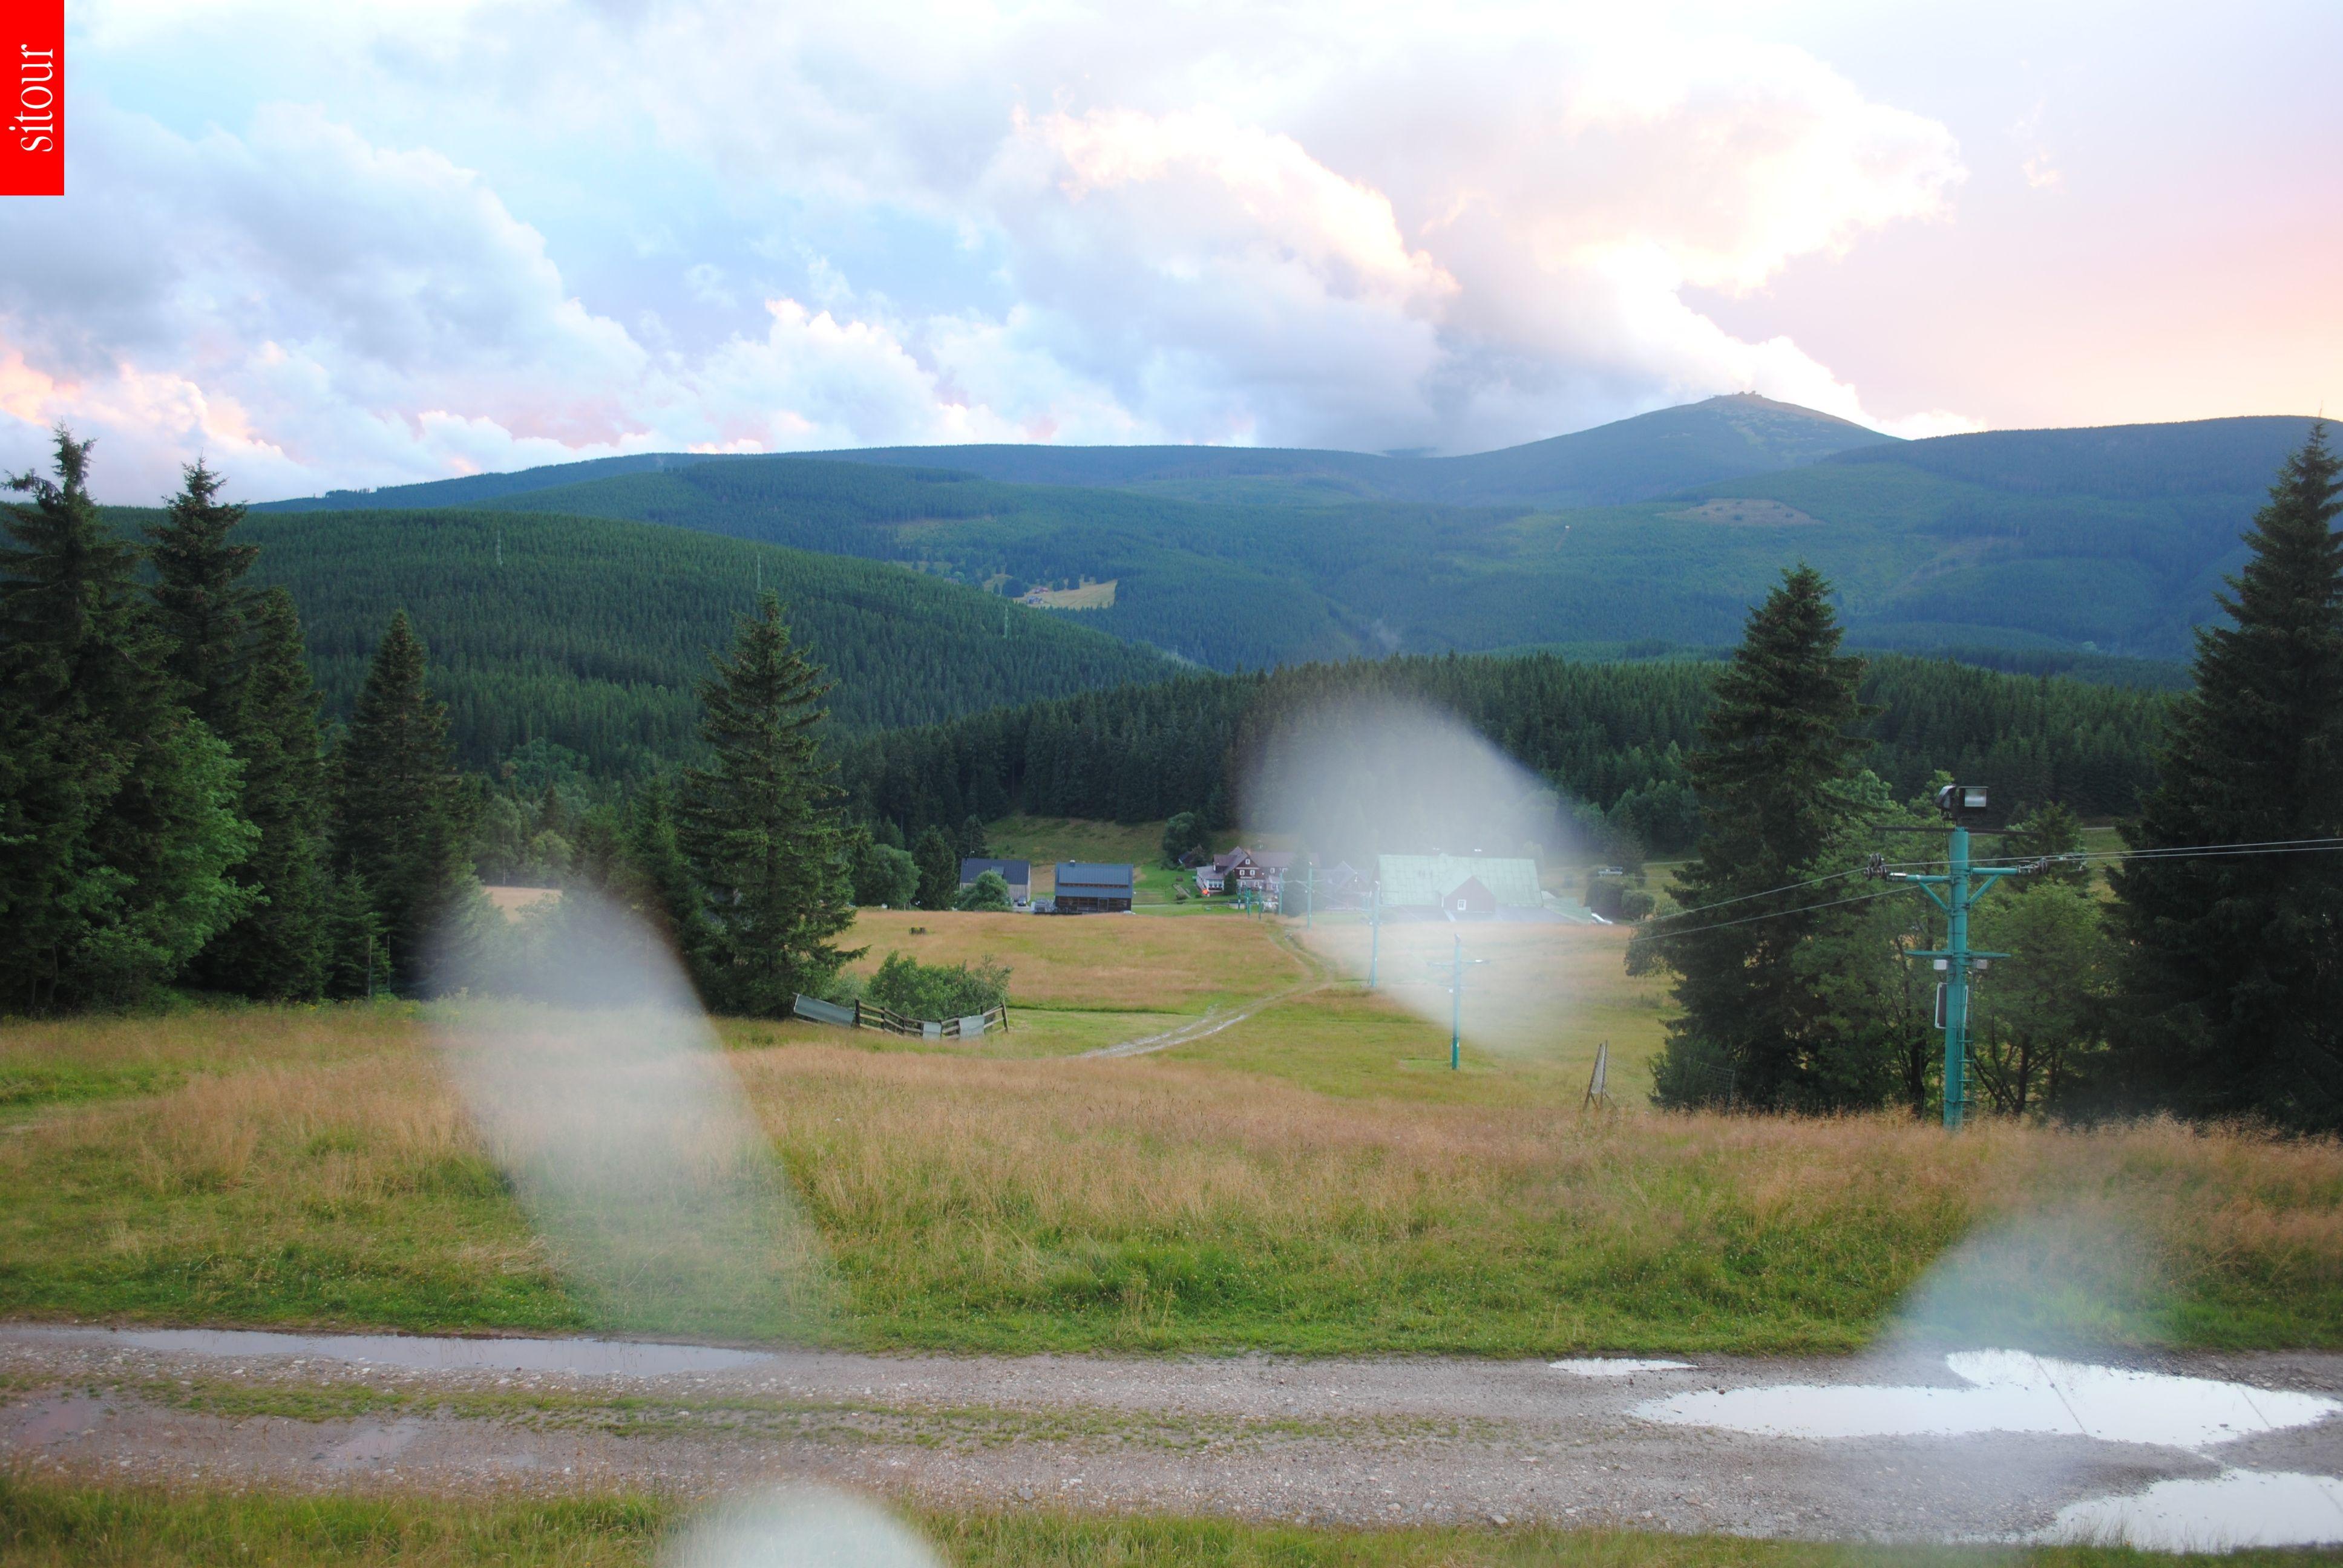 Webcam Ski Resort Mala Upa cam 4 - Giant Mountains